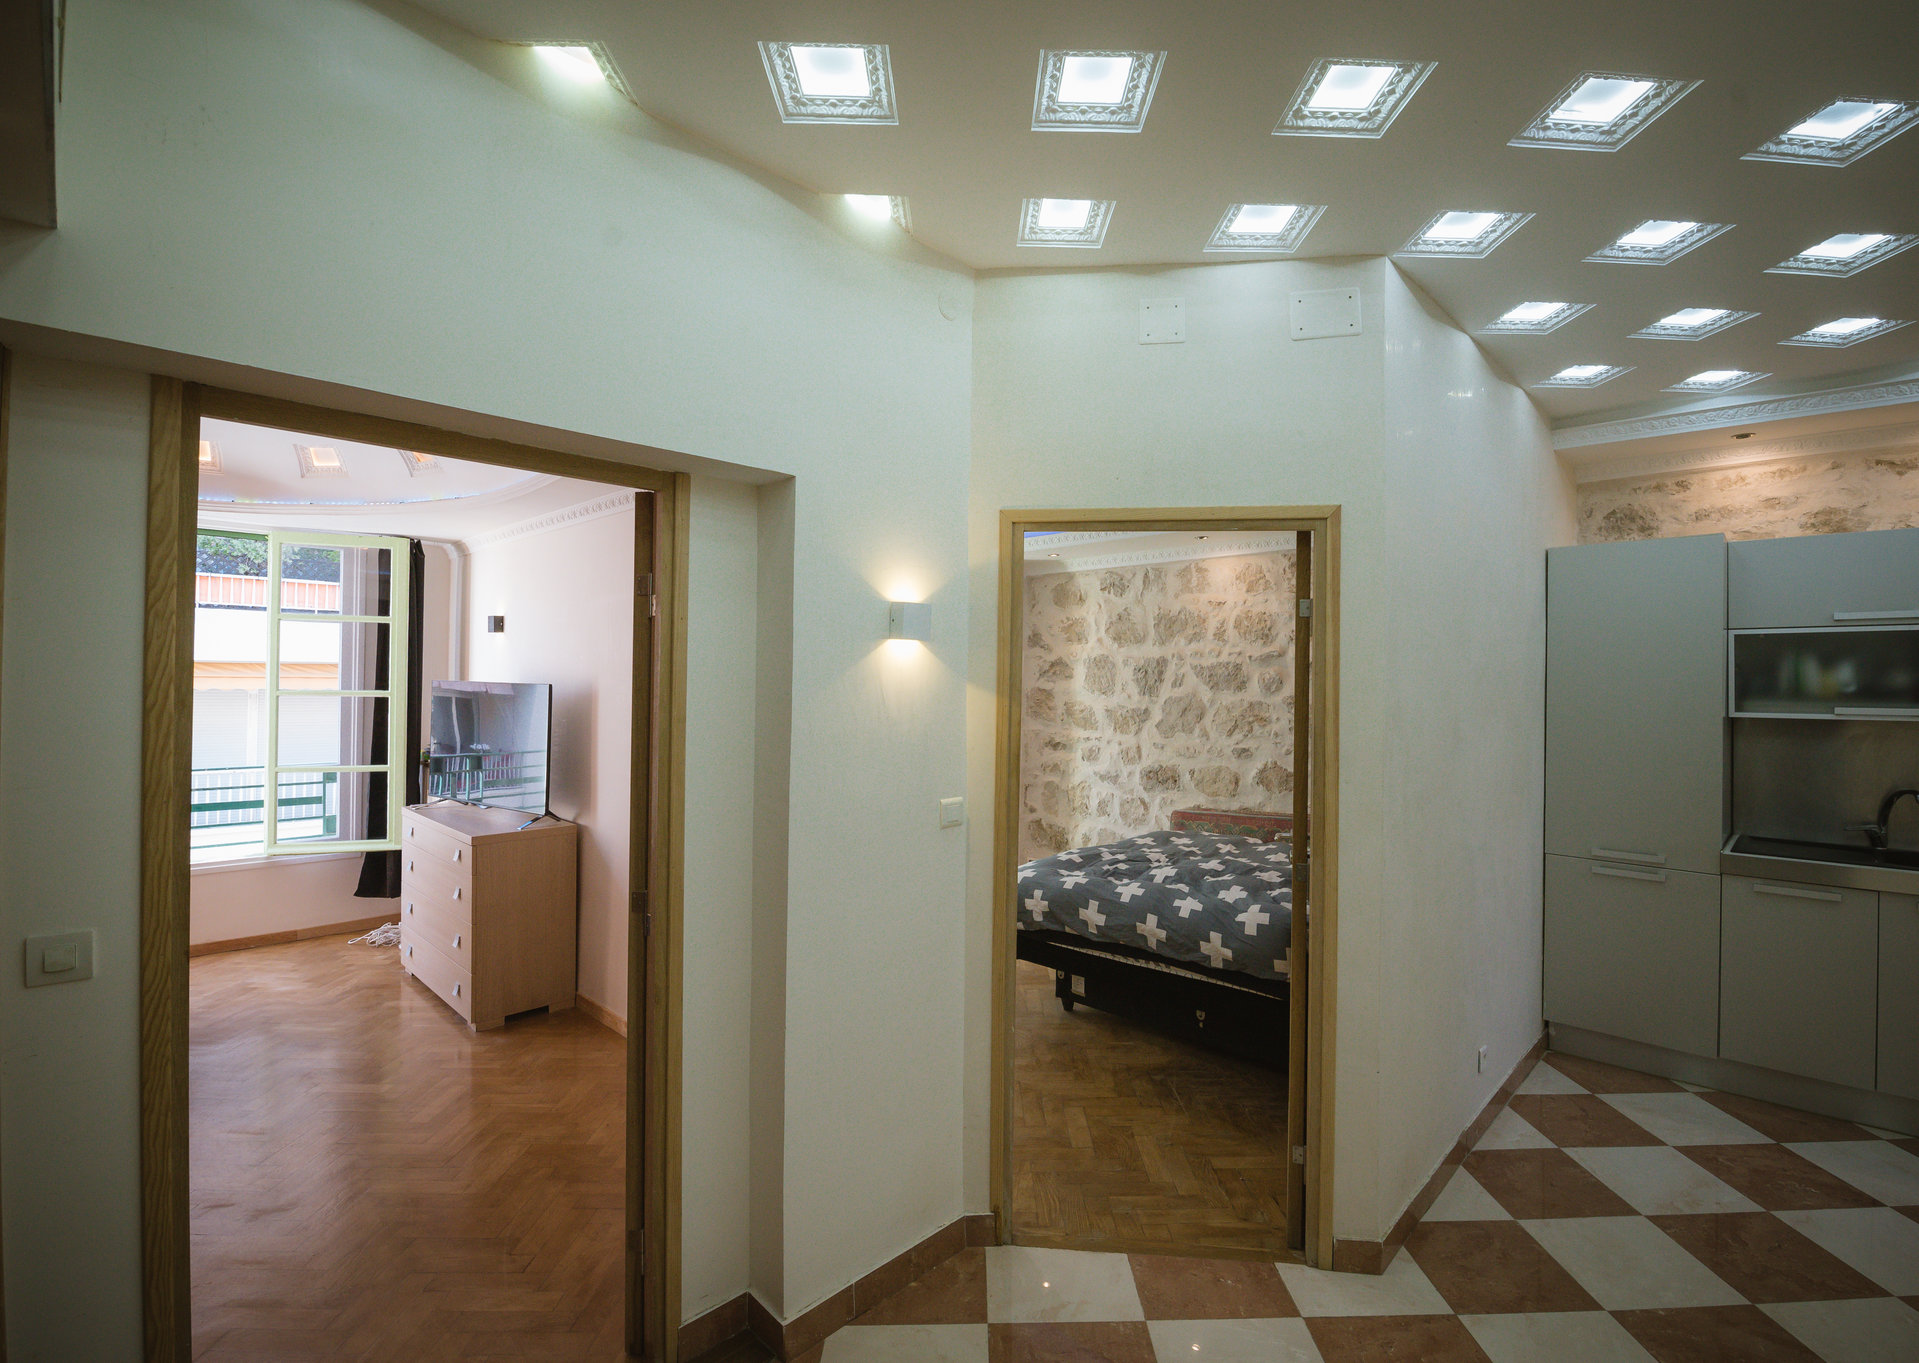 Vitor Hugo / berlioz  : superbe 2 pièces 55 m2  , balcon